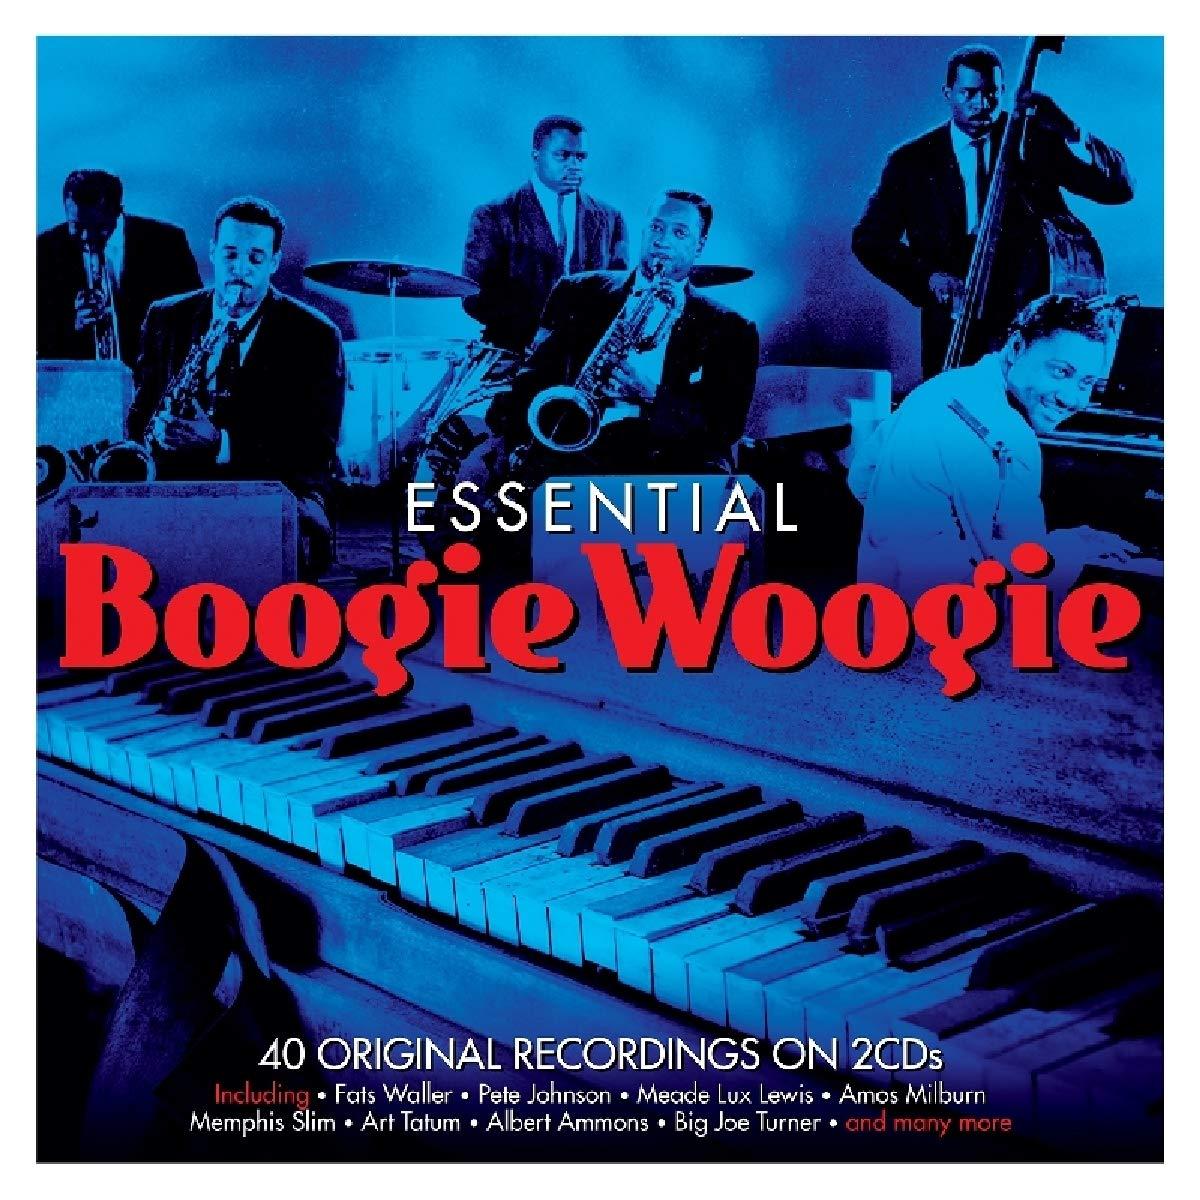 VA - Essential Boogie Woogie (2CD, 2019)